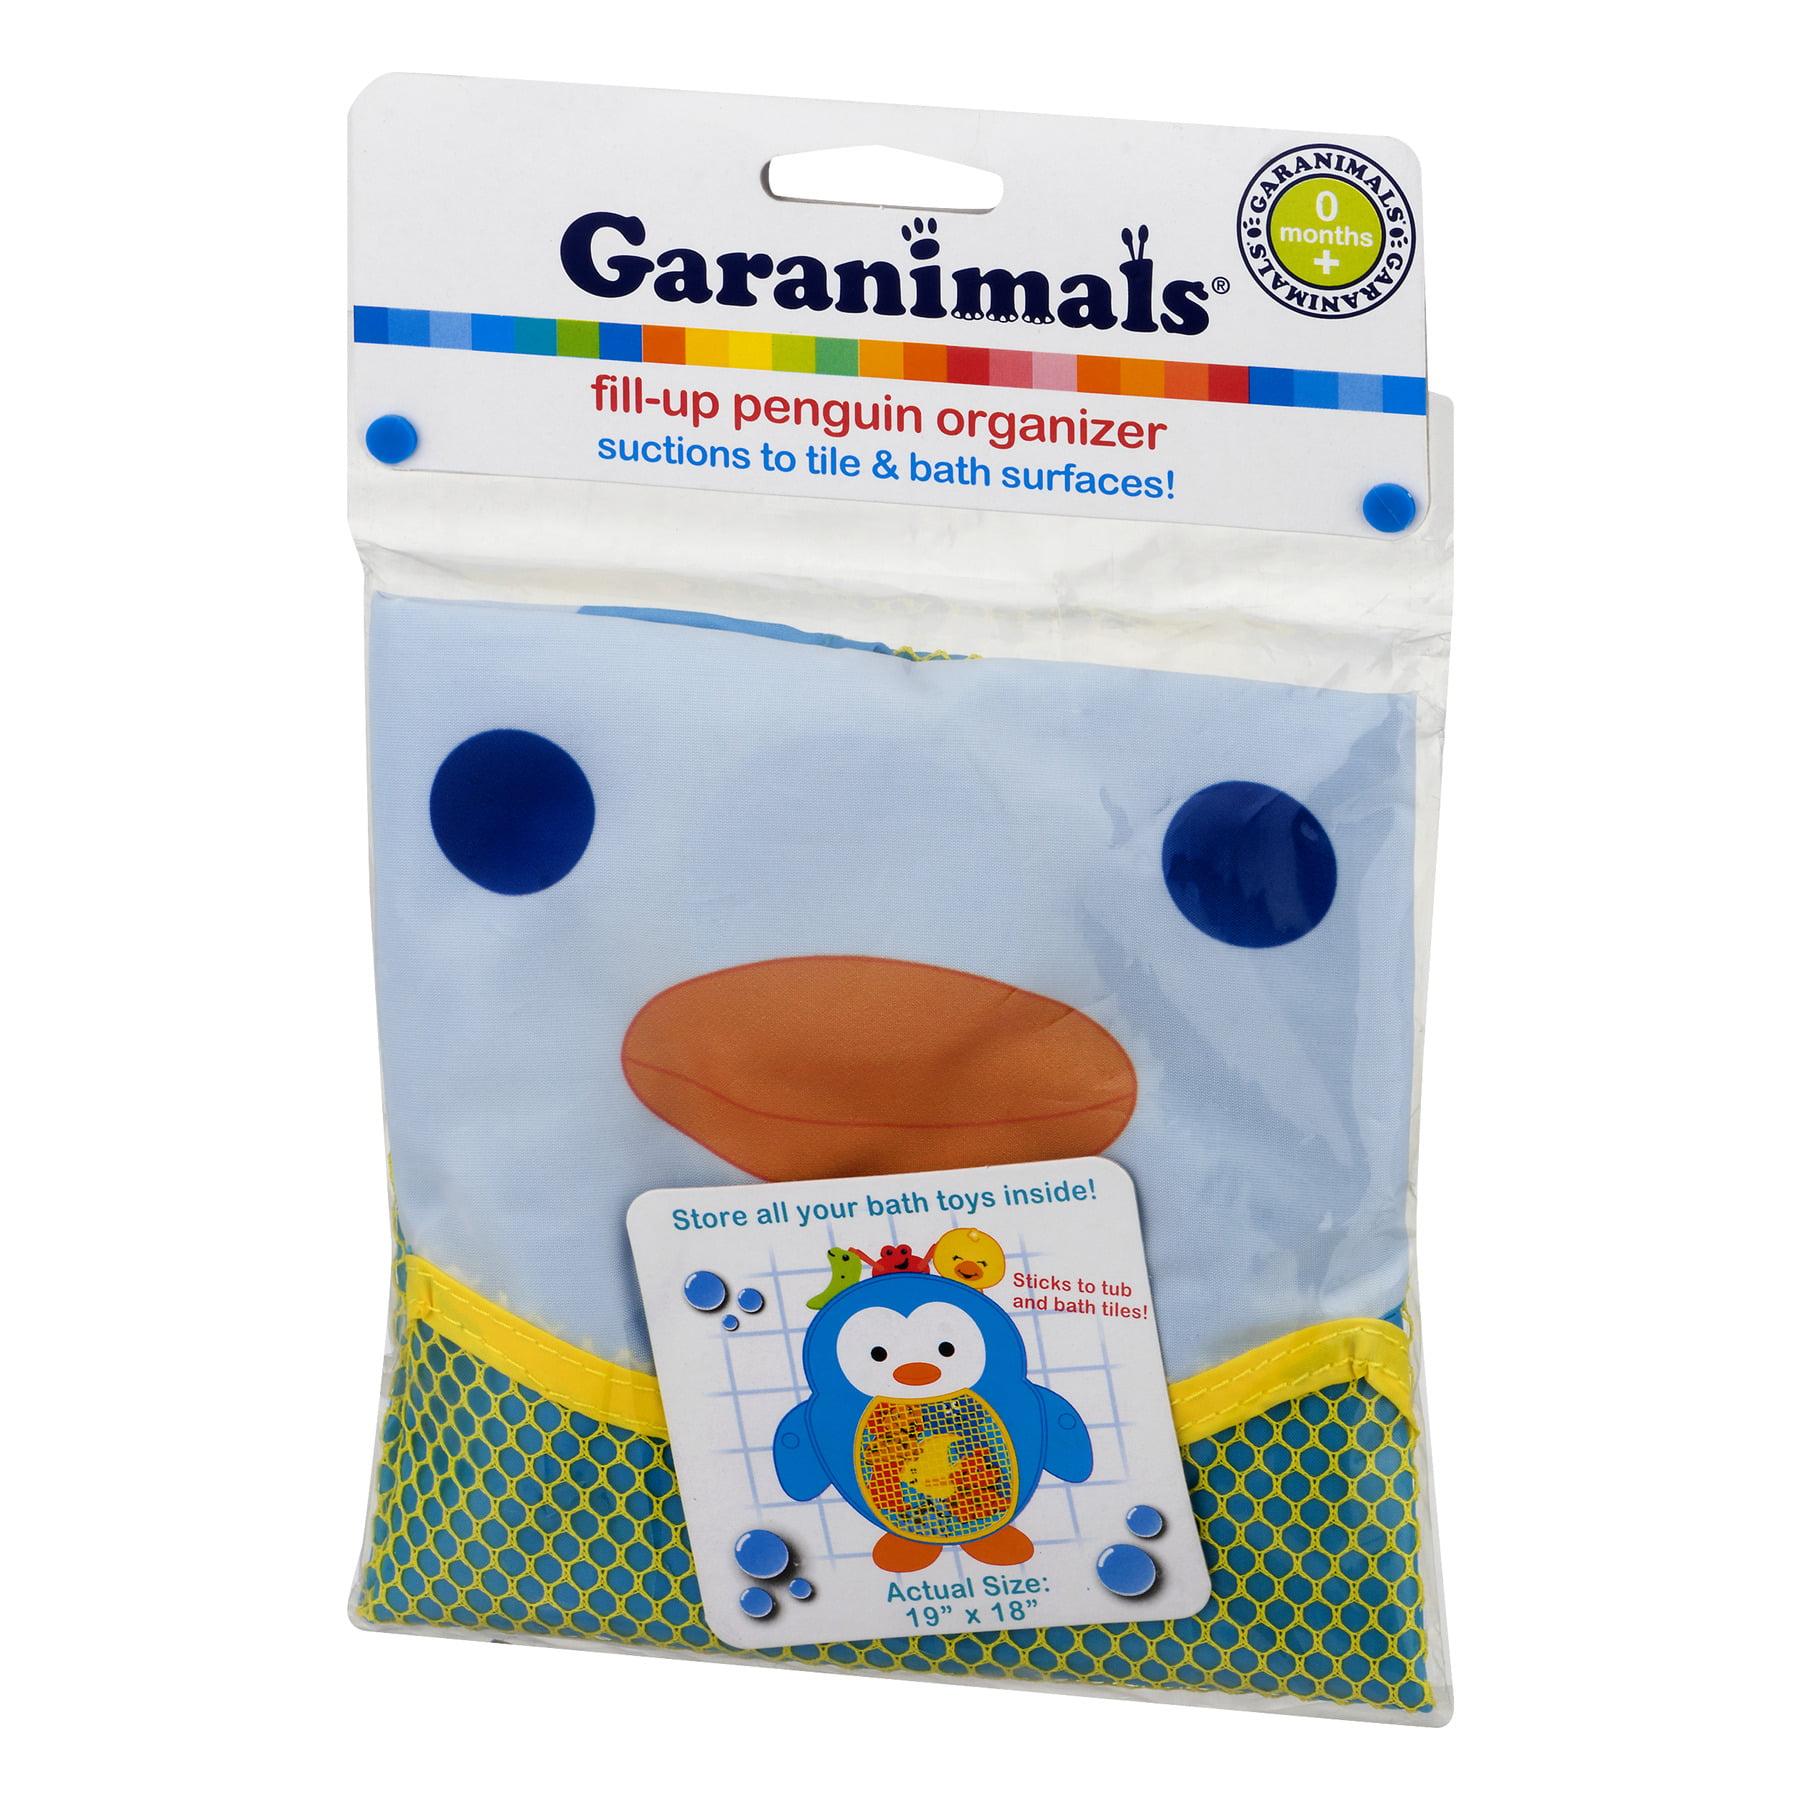 Garanimals Fill-Up Penguin Organizer, 1.0 CT - Walmart.com